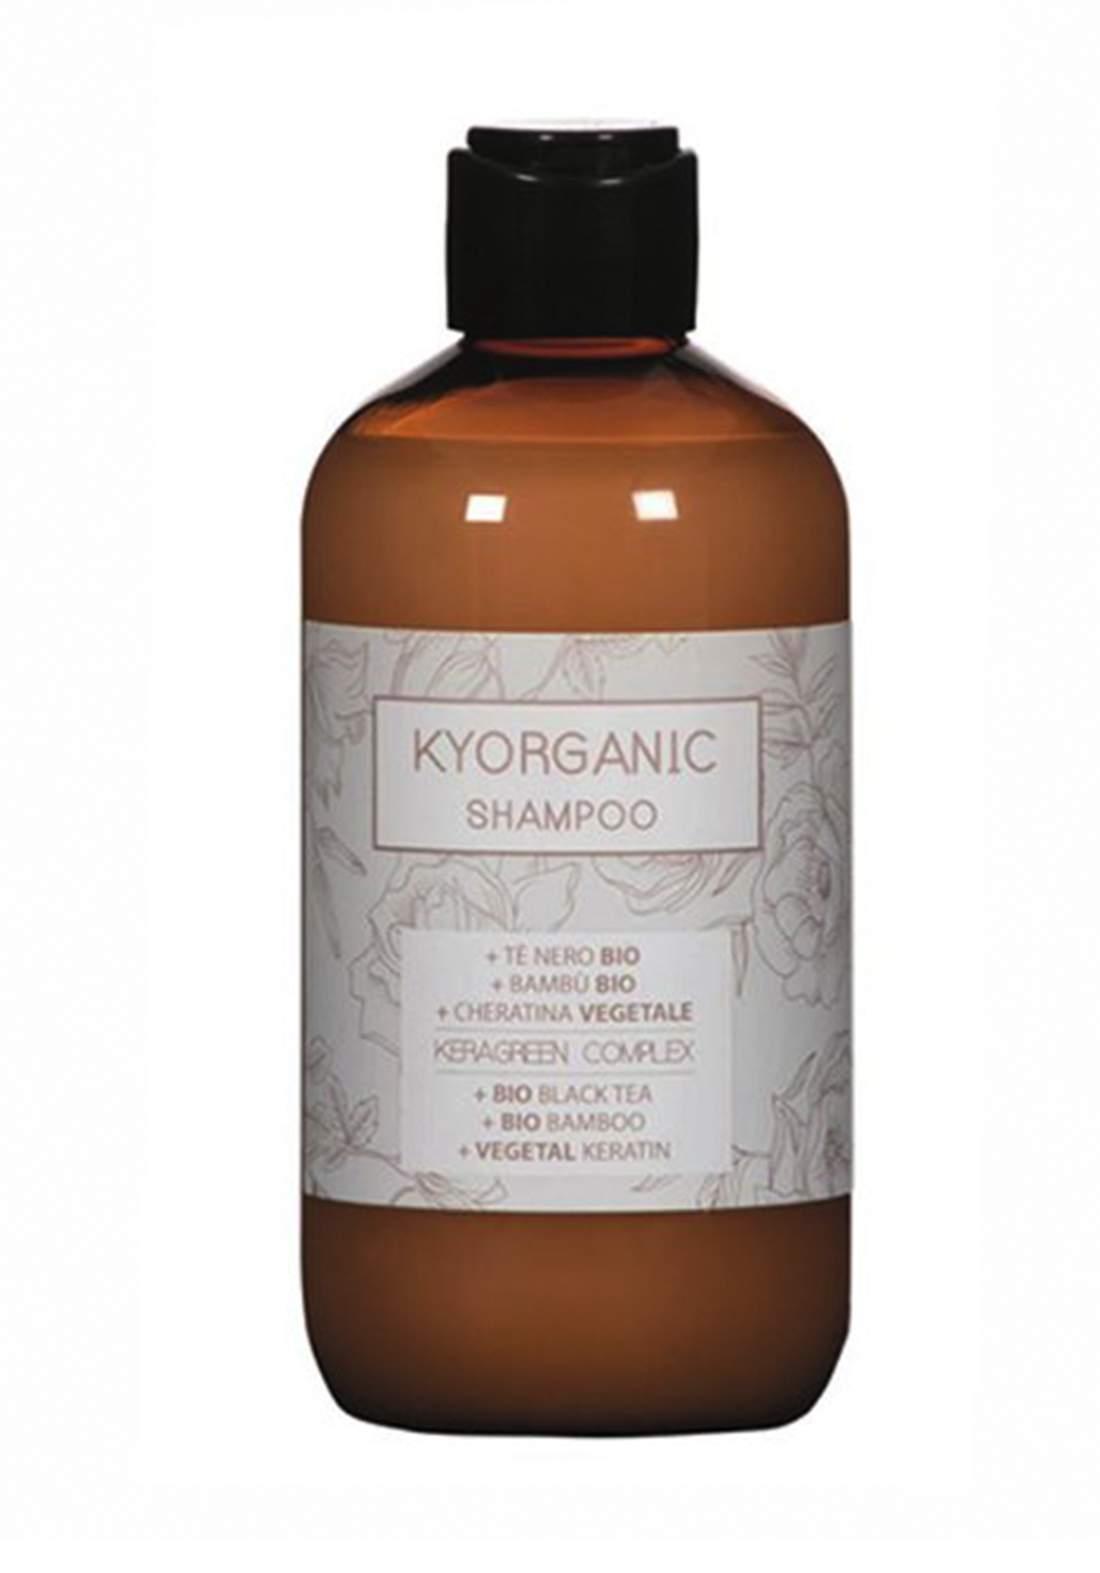 Kyo Kyorganic Shampoo 250 ml - Gray شامبو مغذي للشعر